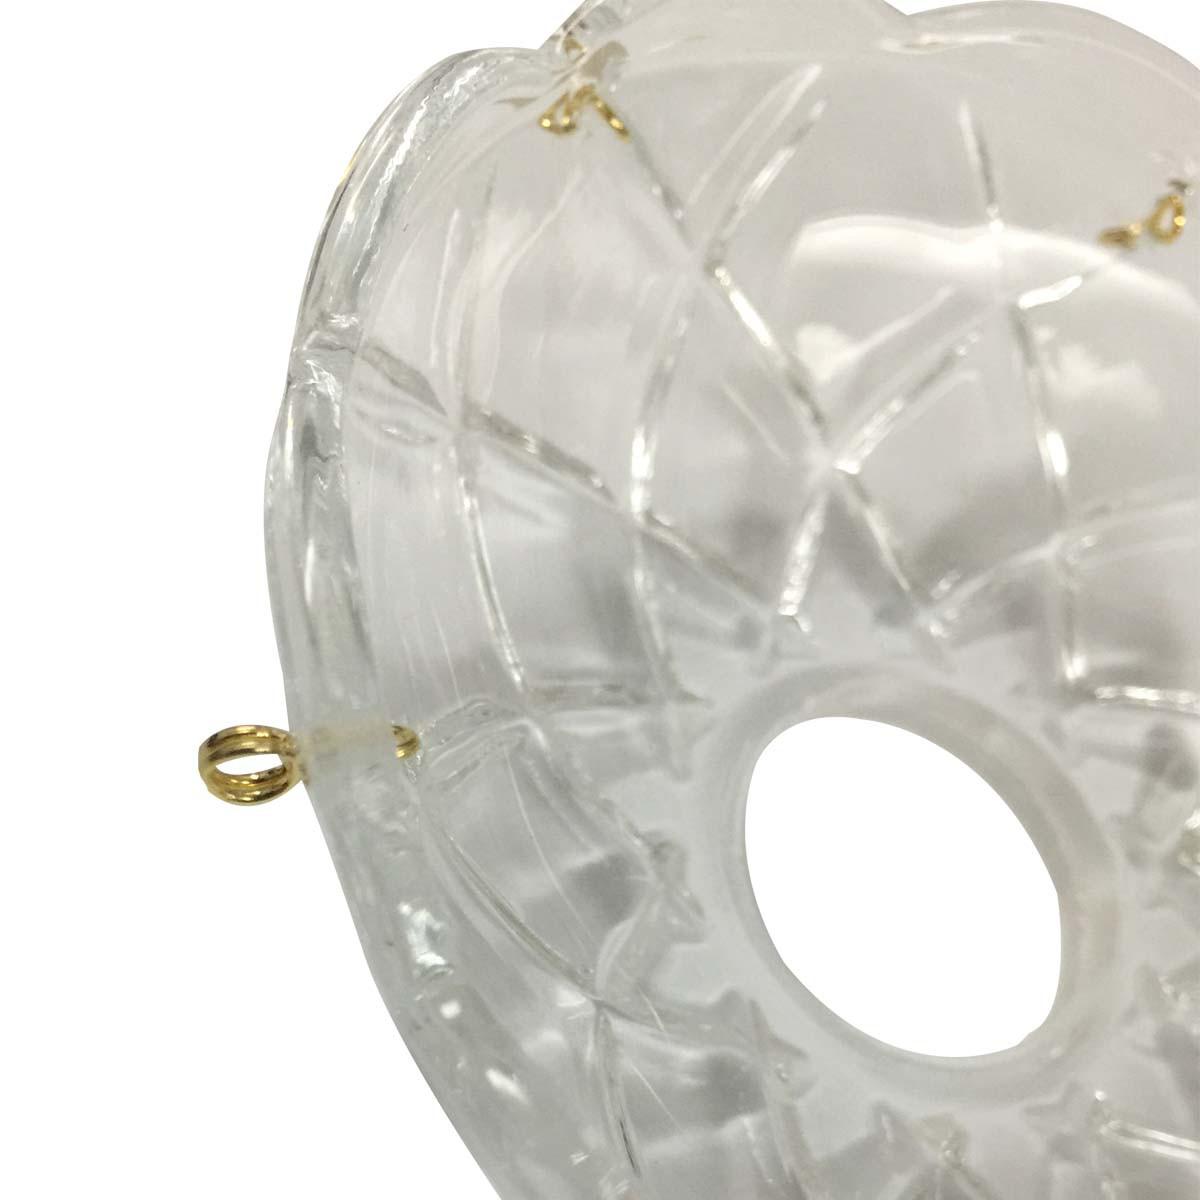 Vintage Bobeche Clear Crystal 6 Prism Hole Scallop 4 D Bobeches Bobeche Crystal Bobeche